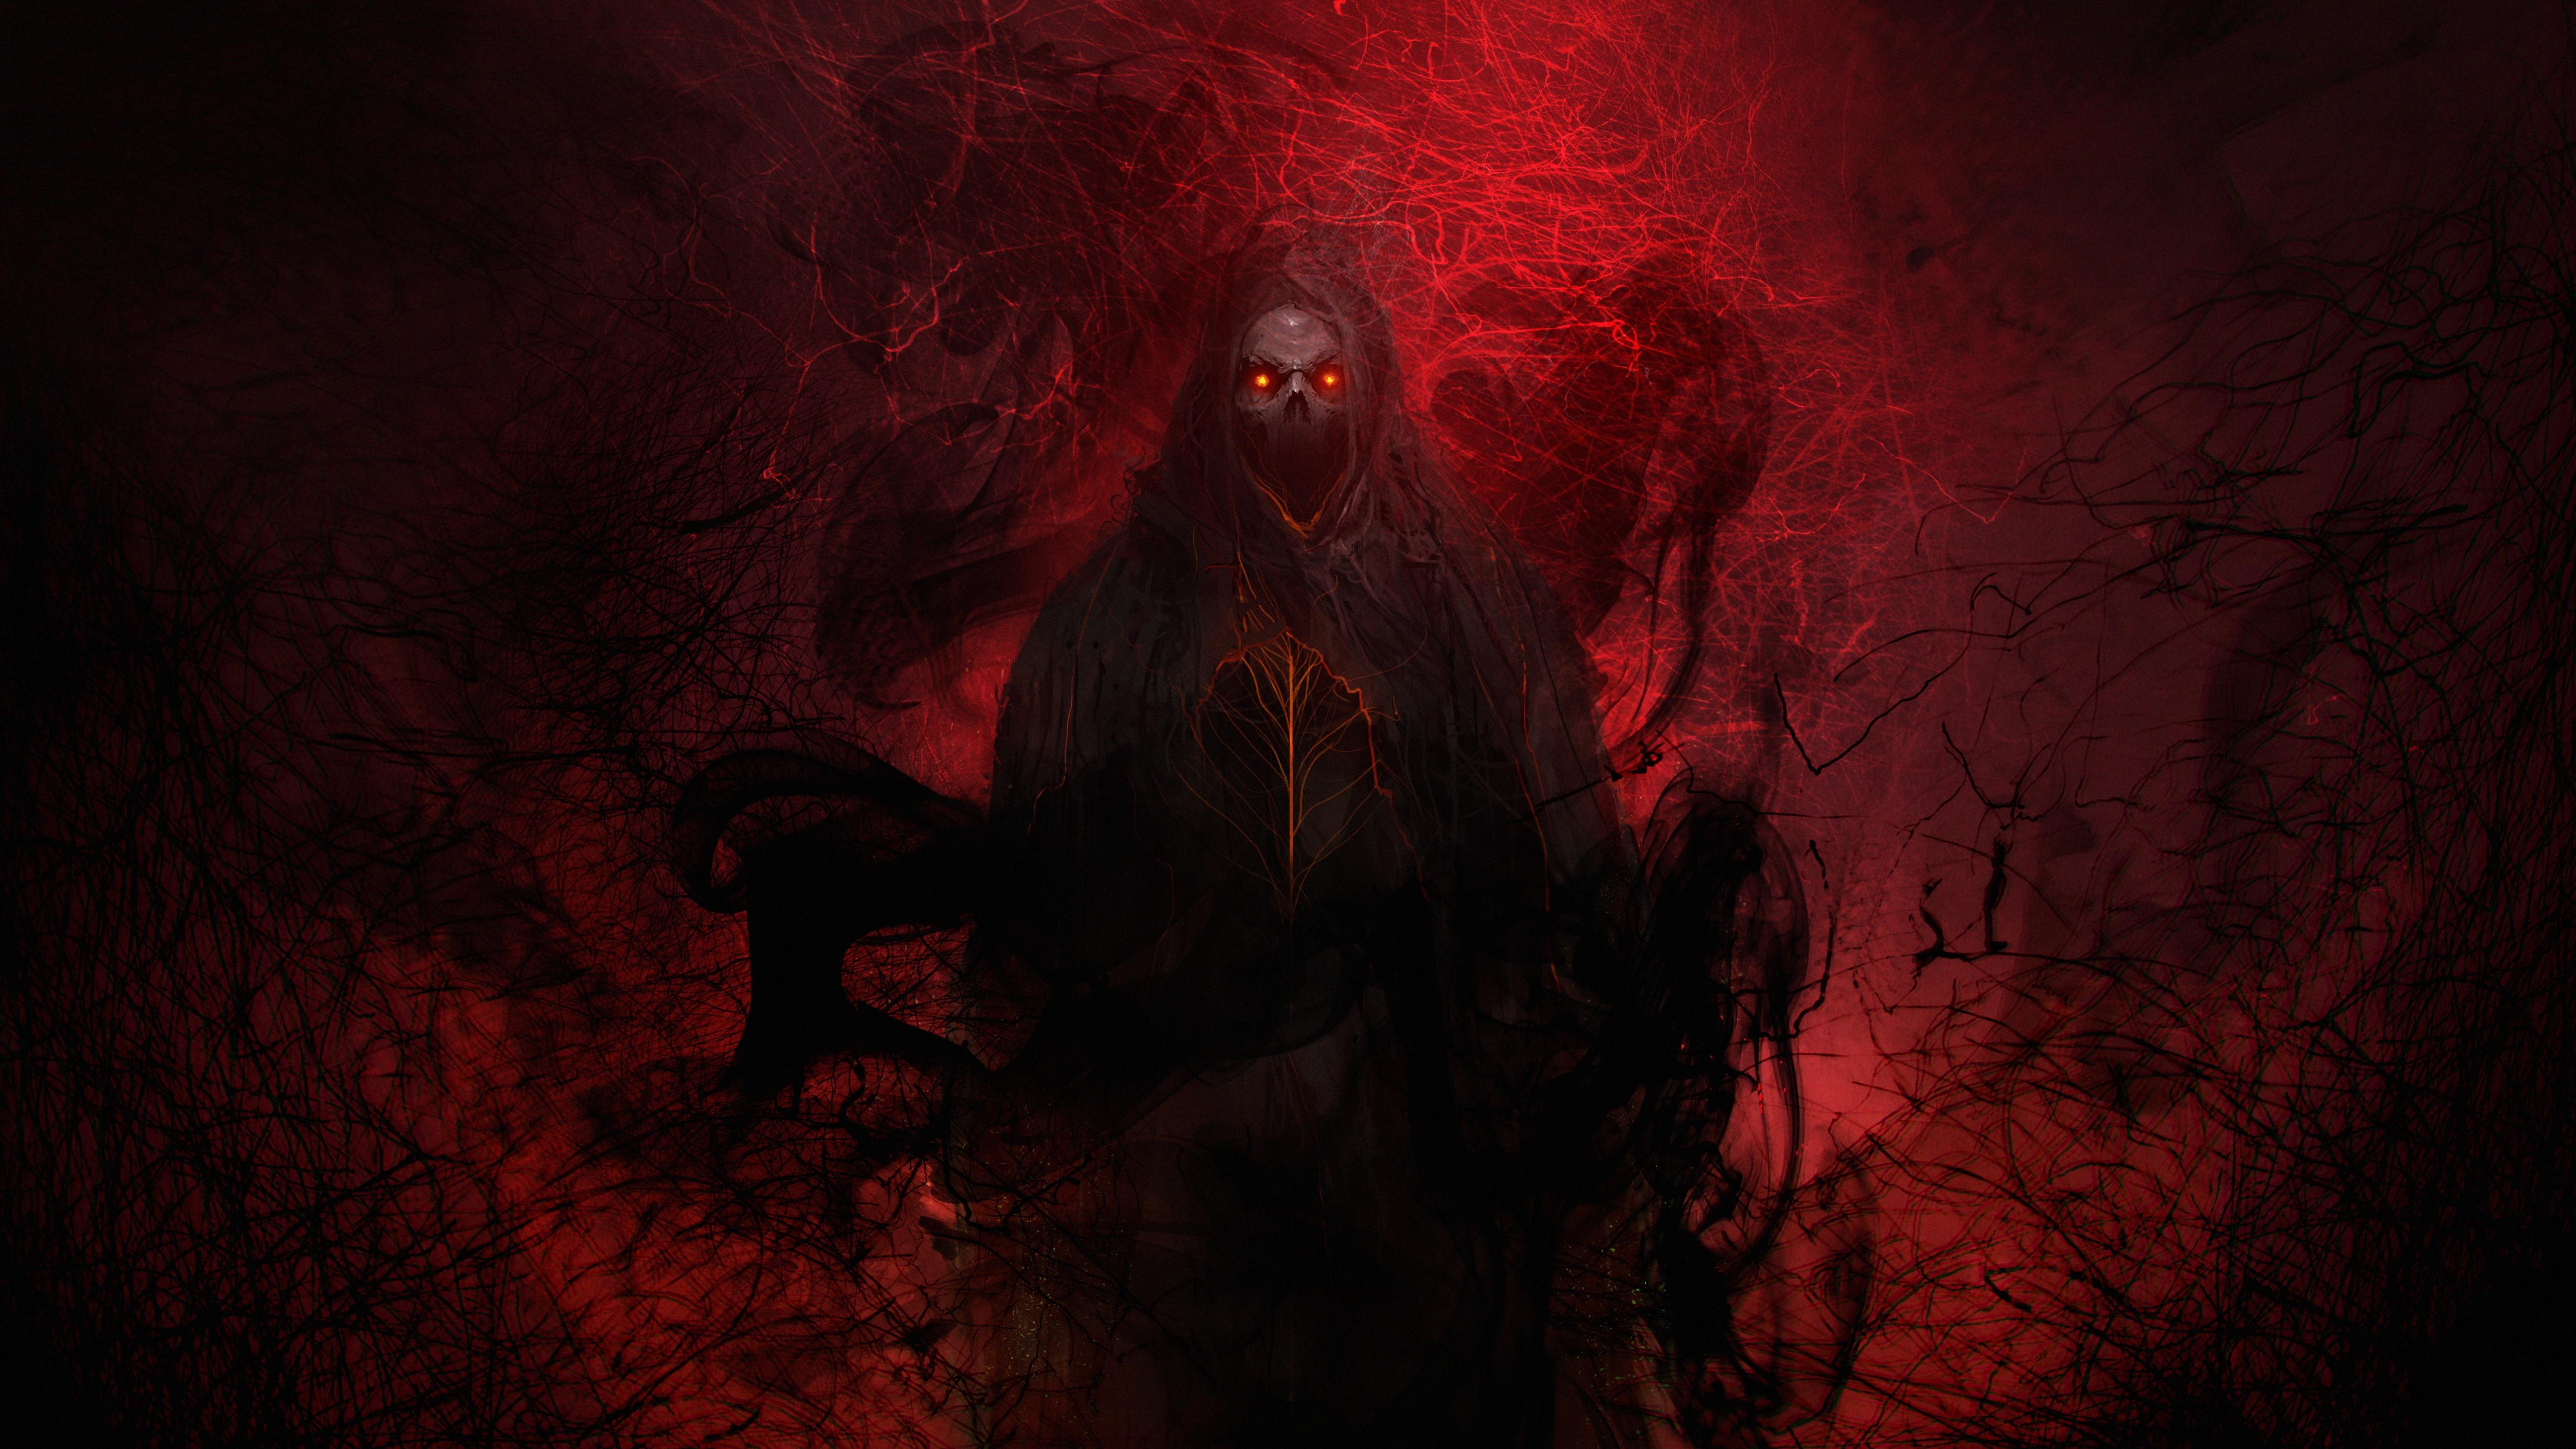 hell 5k cgi graphics frightening demon scary